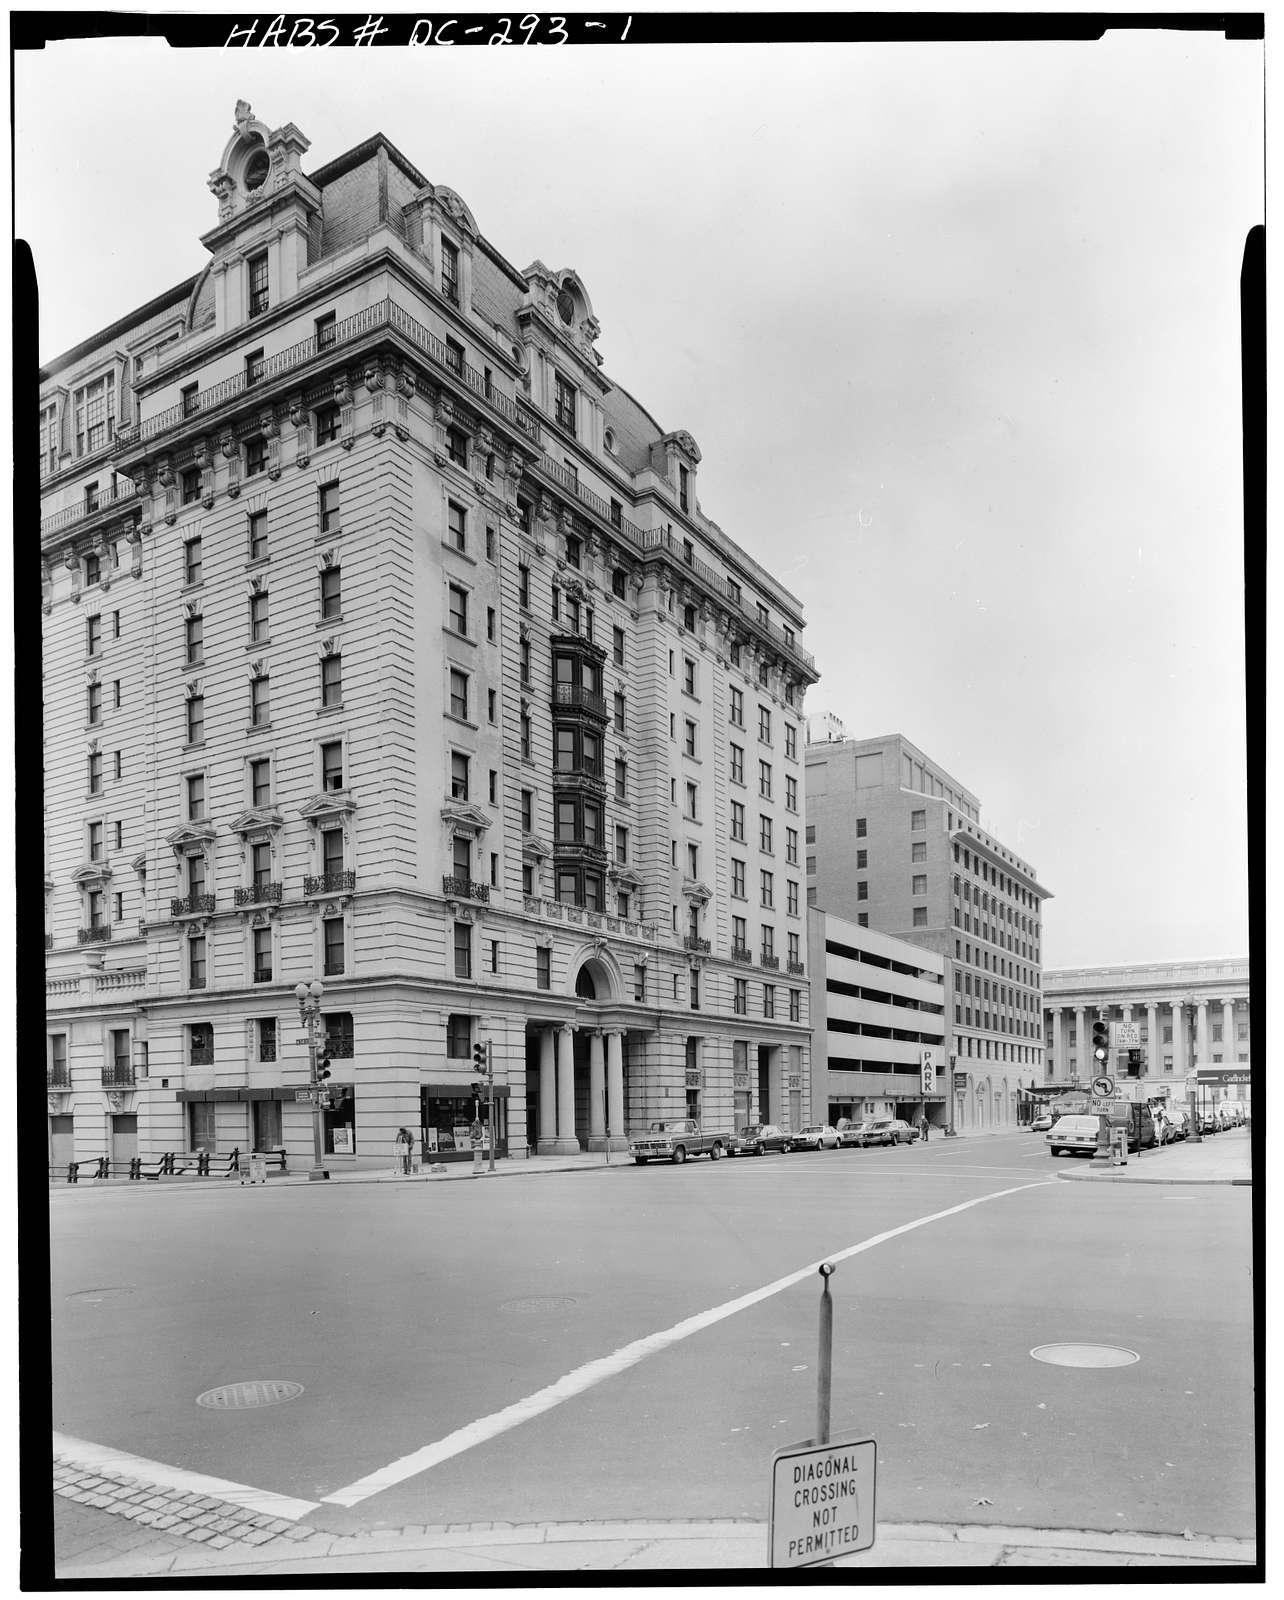 Willard Hotel, 1401-1409 Pennsylvania Avenue Northwest, Washington, District of Columbia, DC